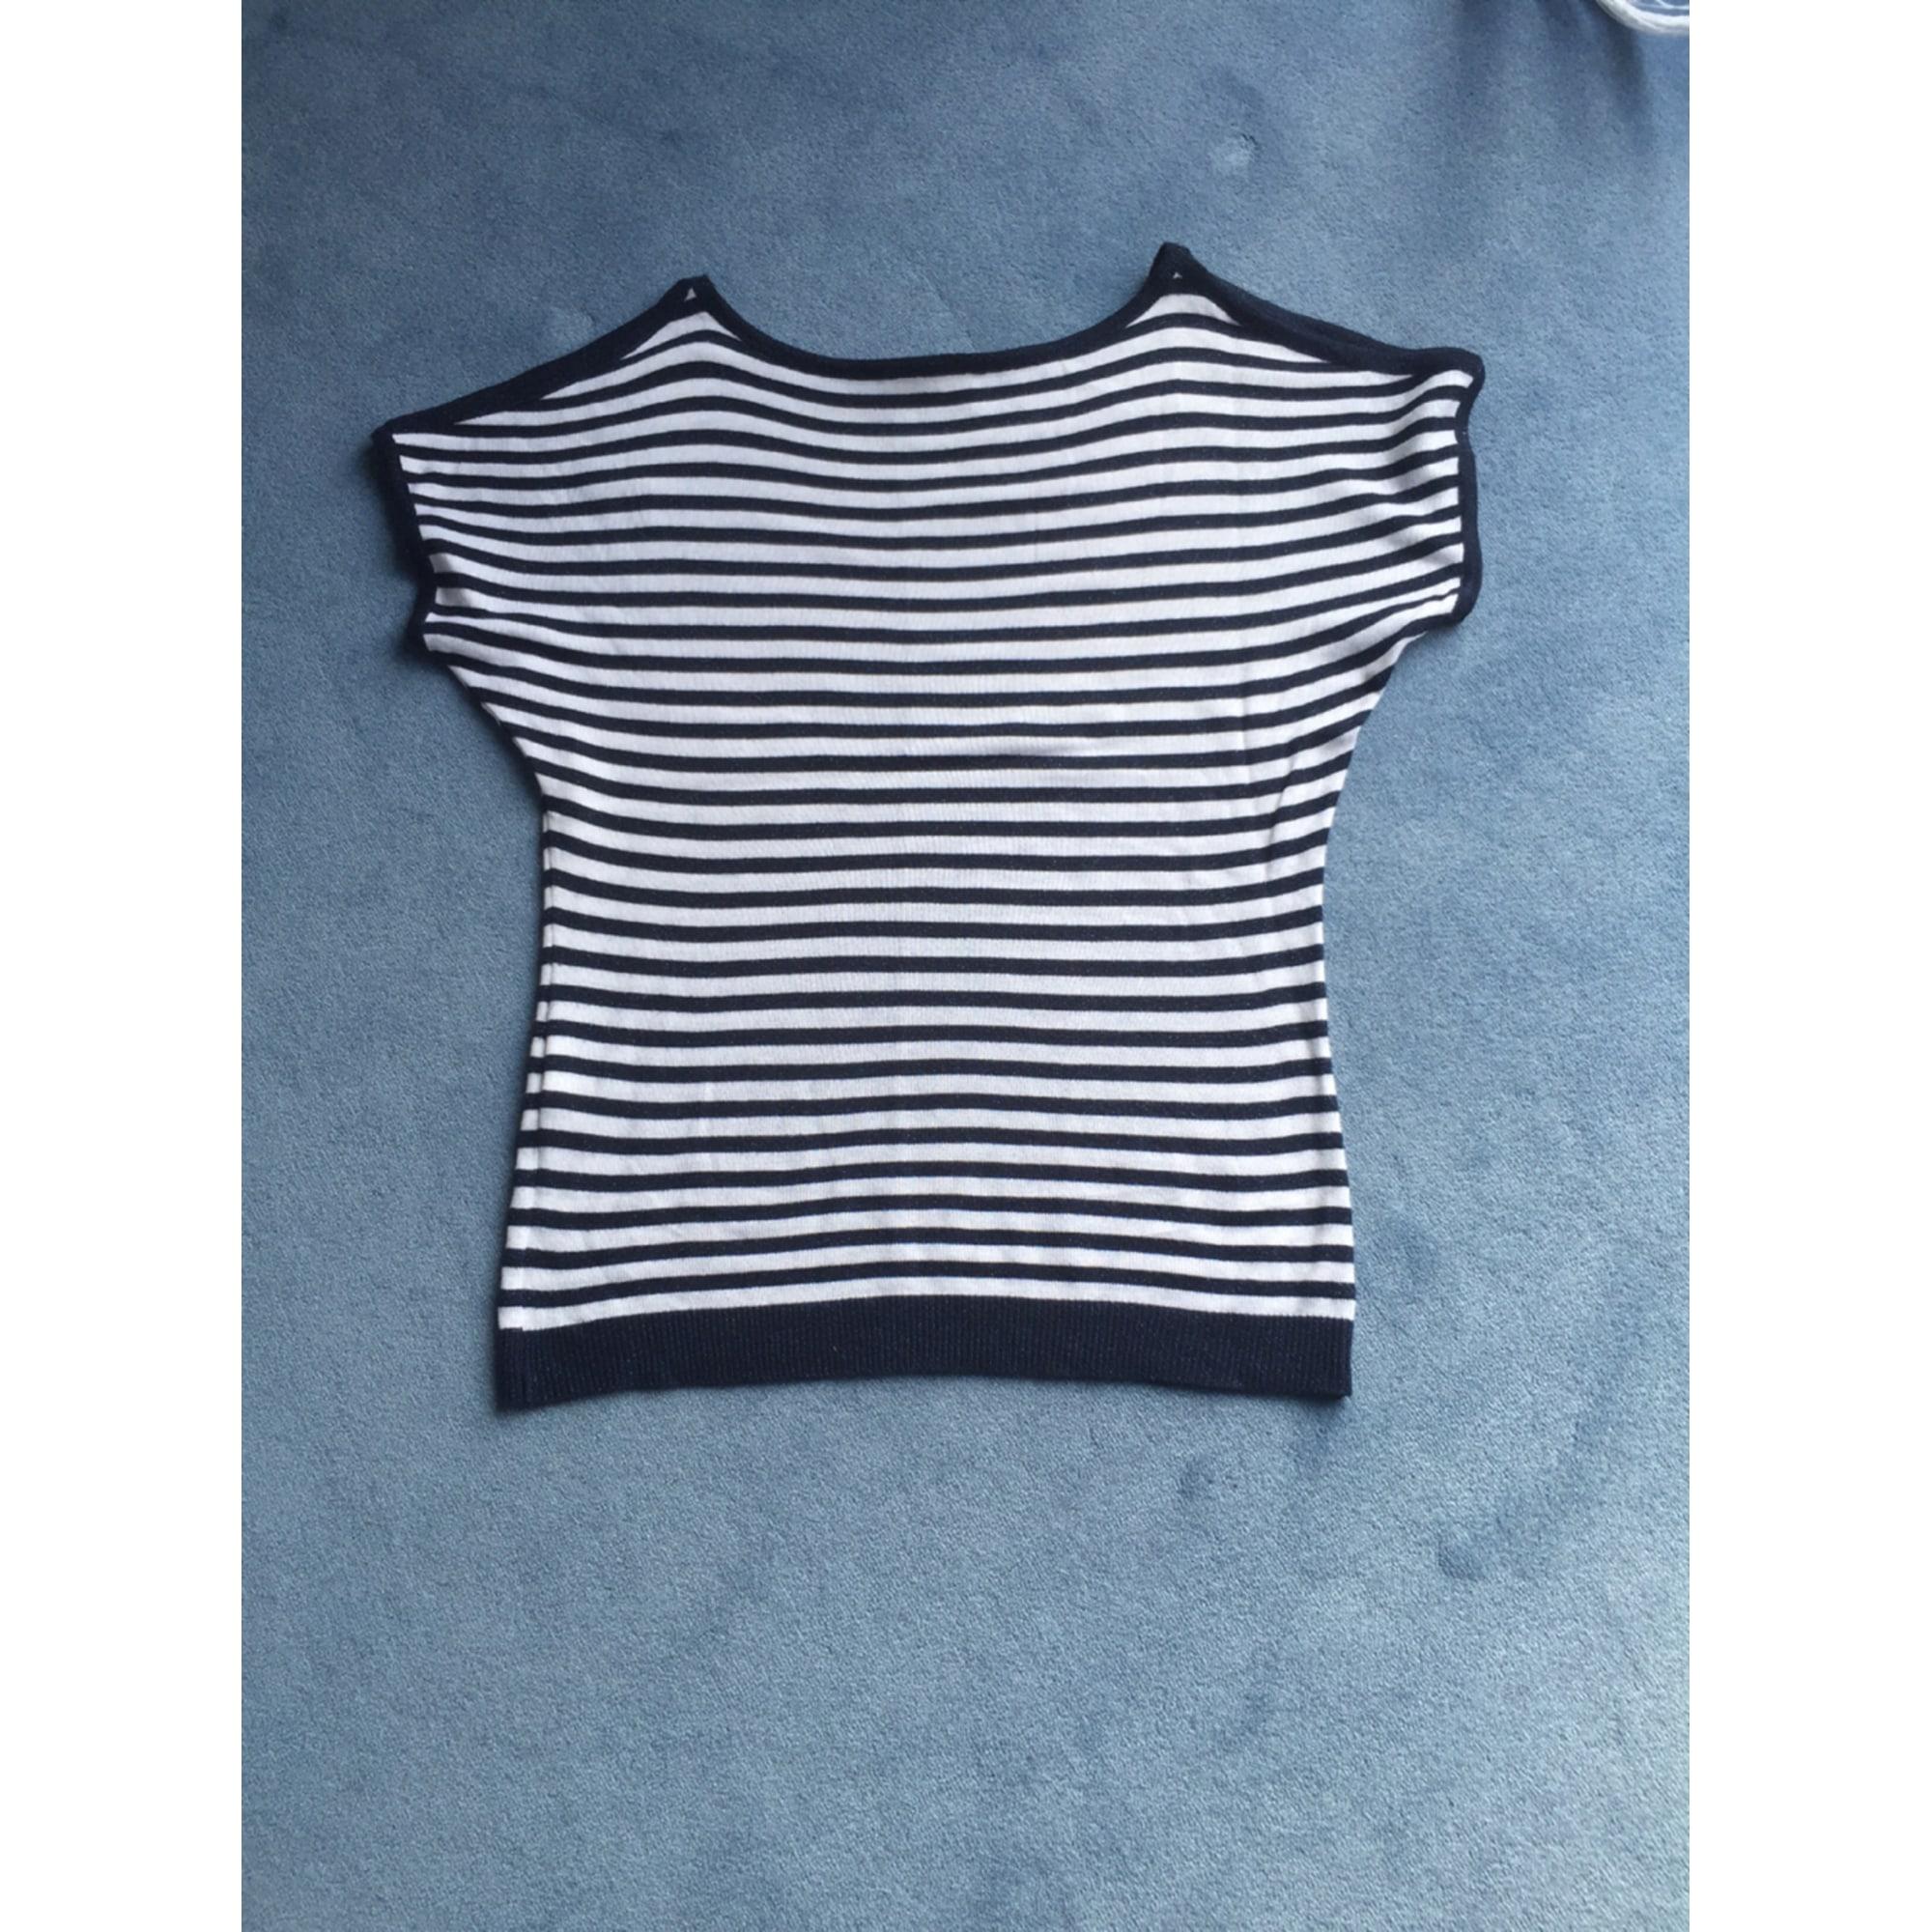 Top, tee-shirt MORGAN Multicouleur